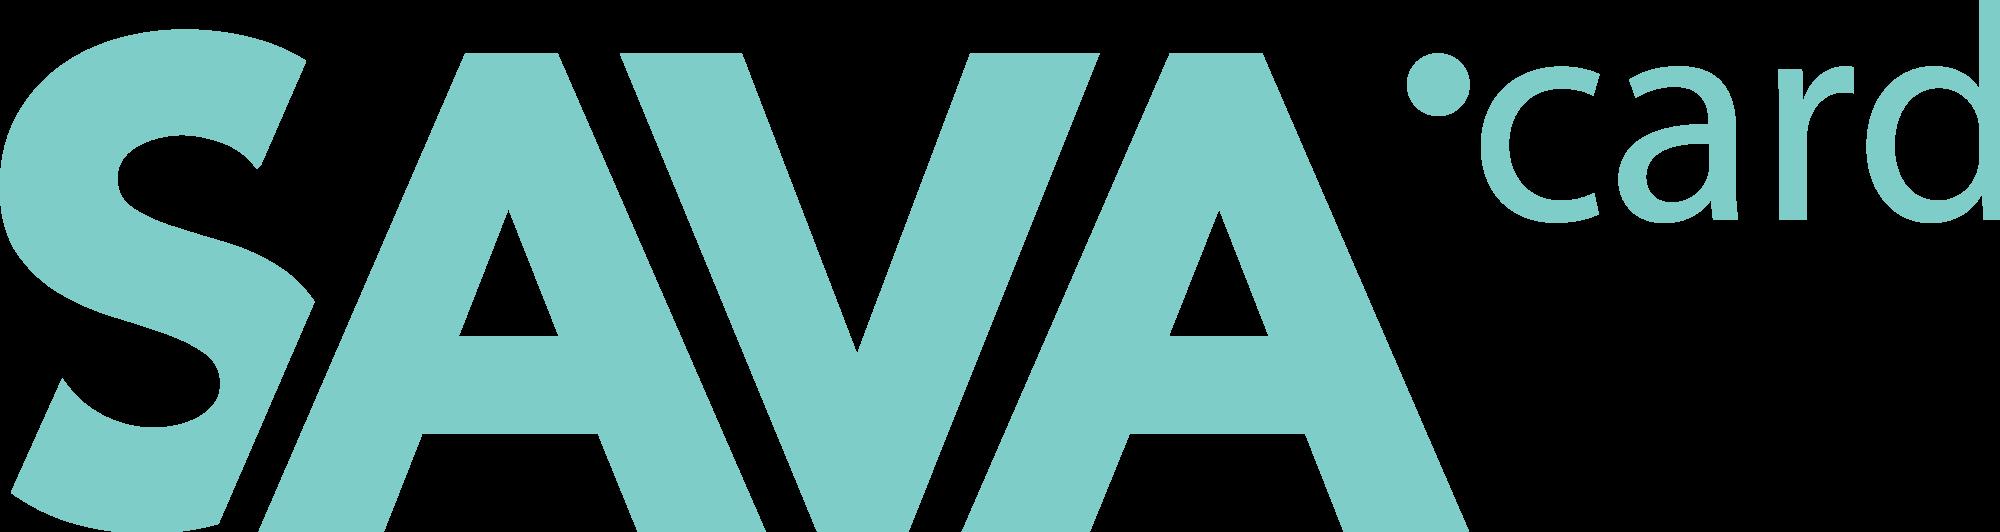 savacard.lv logo